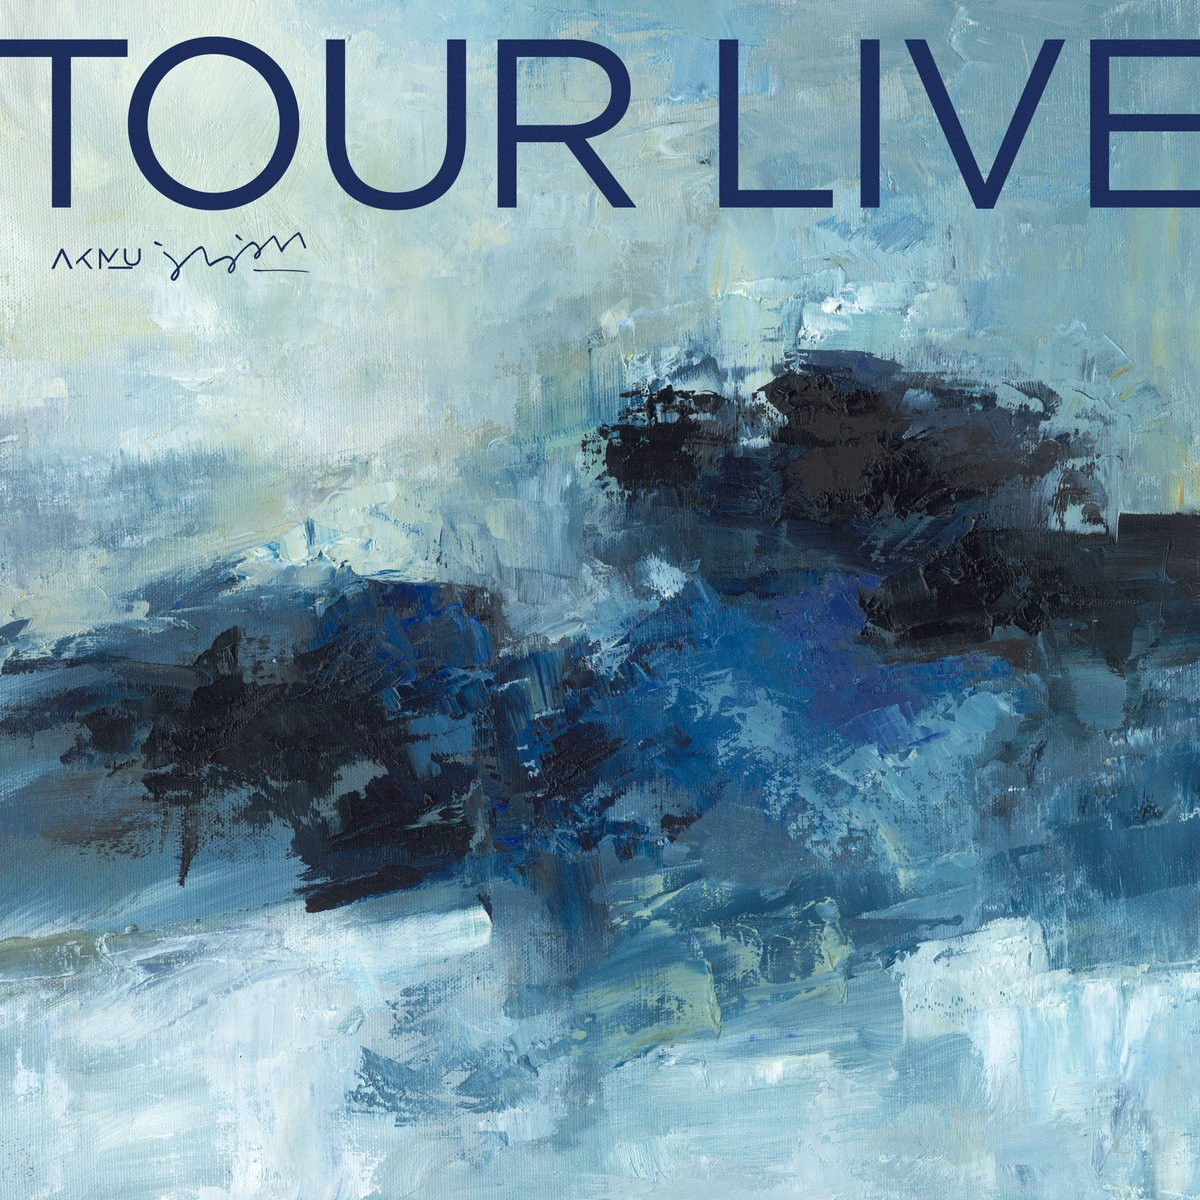 [#AKMU '항해' TOUR LIVE] AKMU의 전국 투어 '항해' 콘서트 실황이 담긴 라이브 음원 발매  자세한 내용  👉   #악뮤 #항해TOUR #SAILINGTOUR #항해TOUR_LIVE #SAILINGTOUR_LIVE #YG